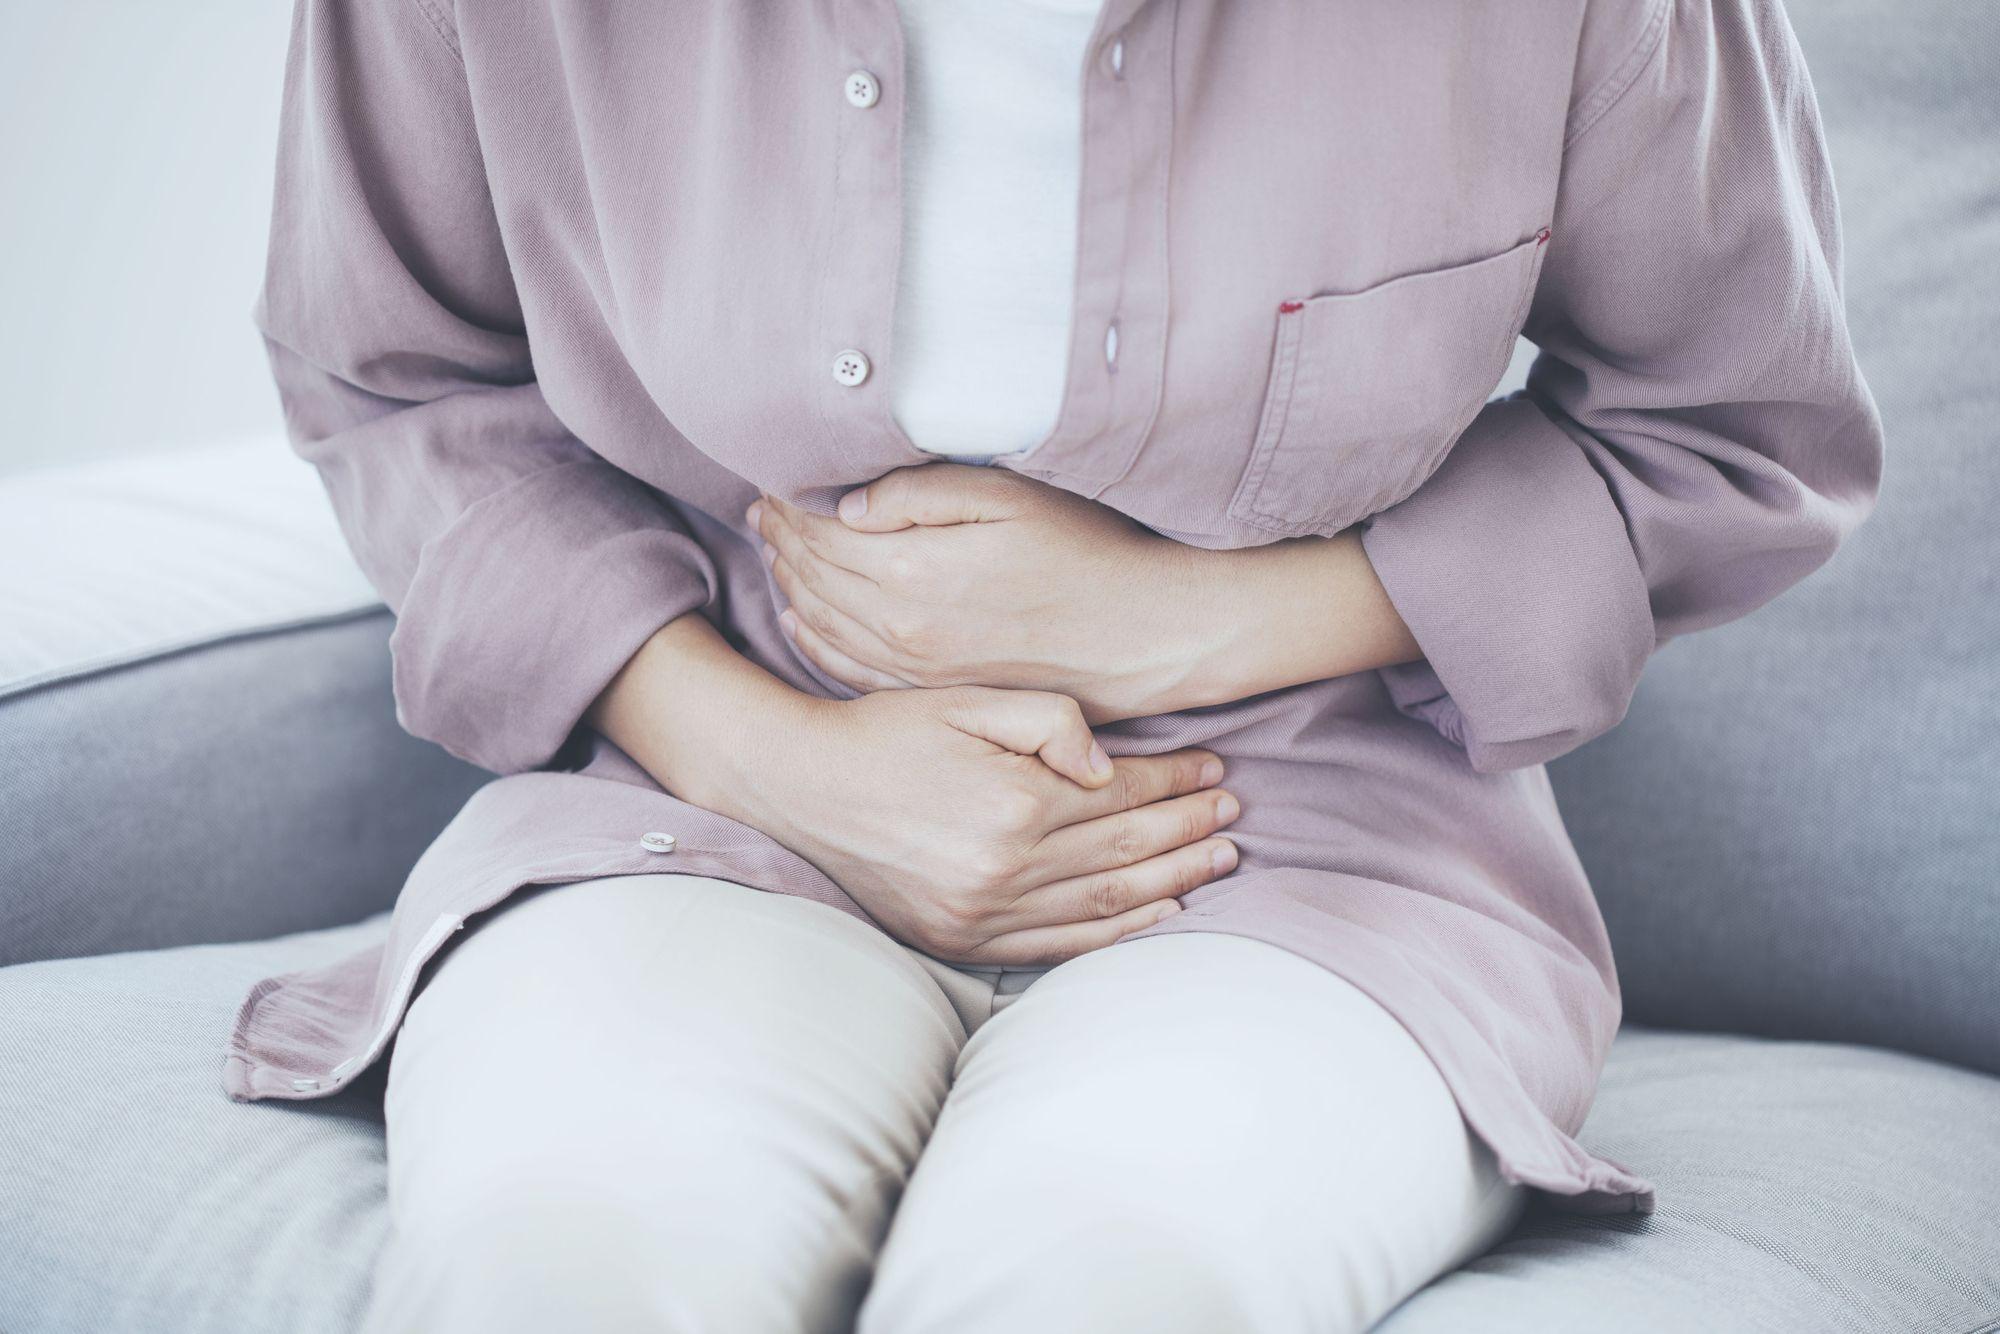 Stomach pain woman